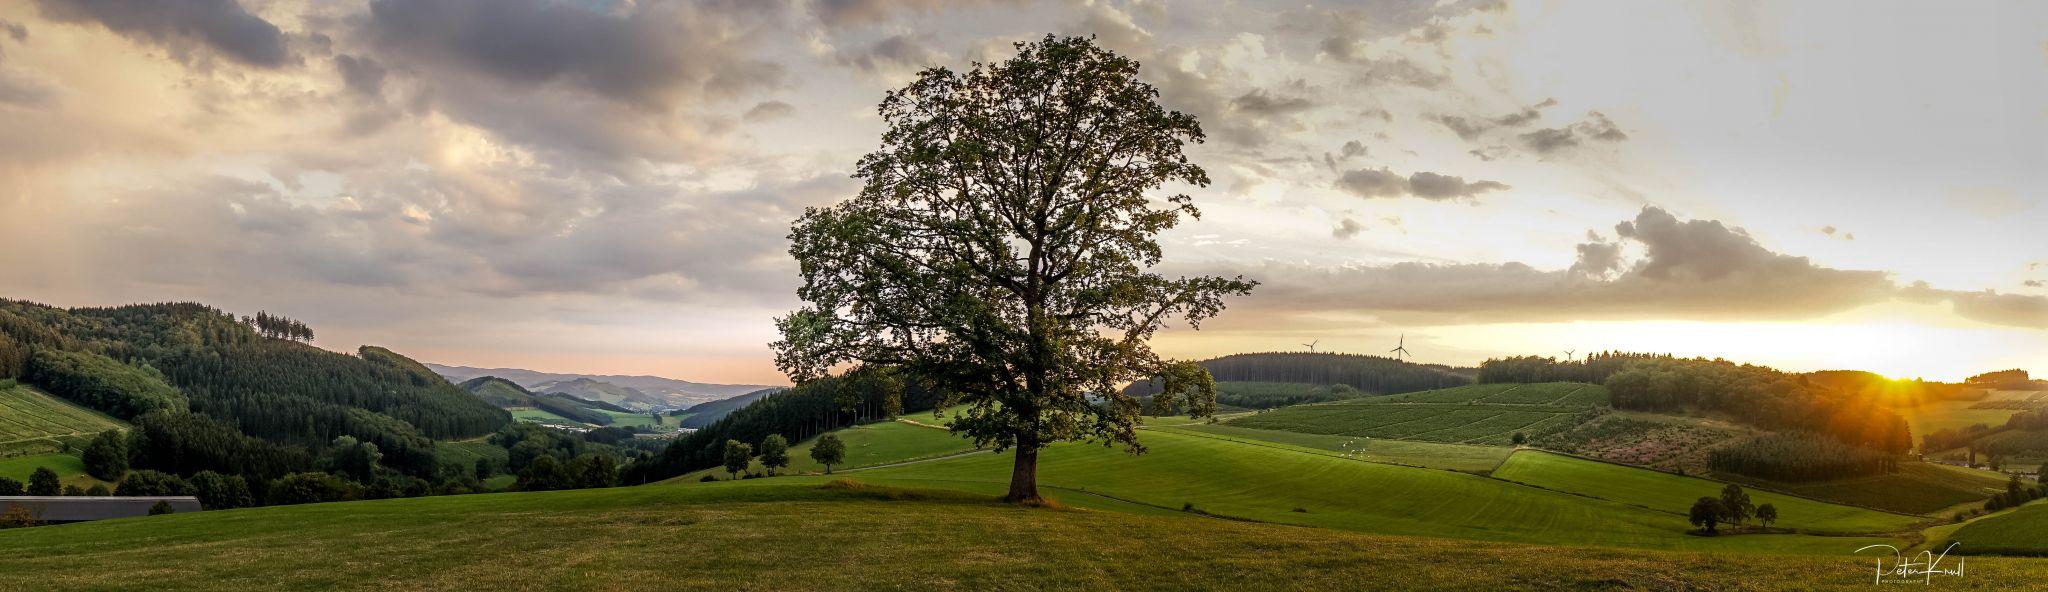 Sauerland Sunset, Germany